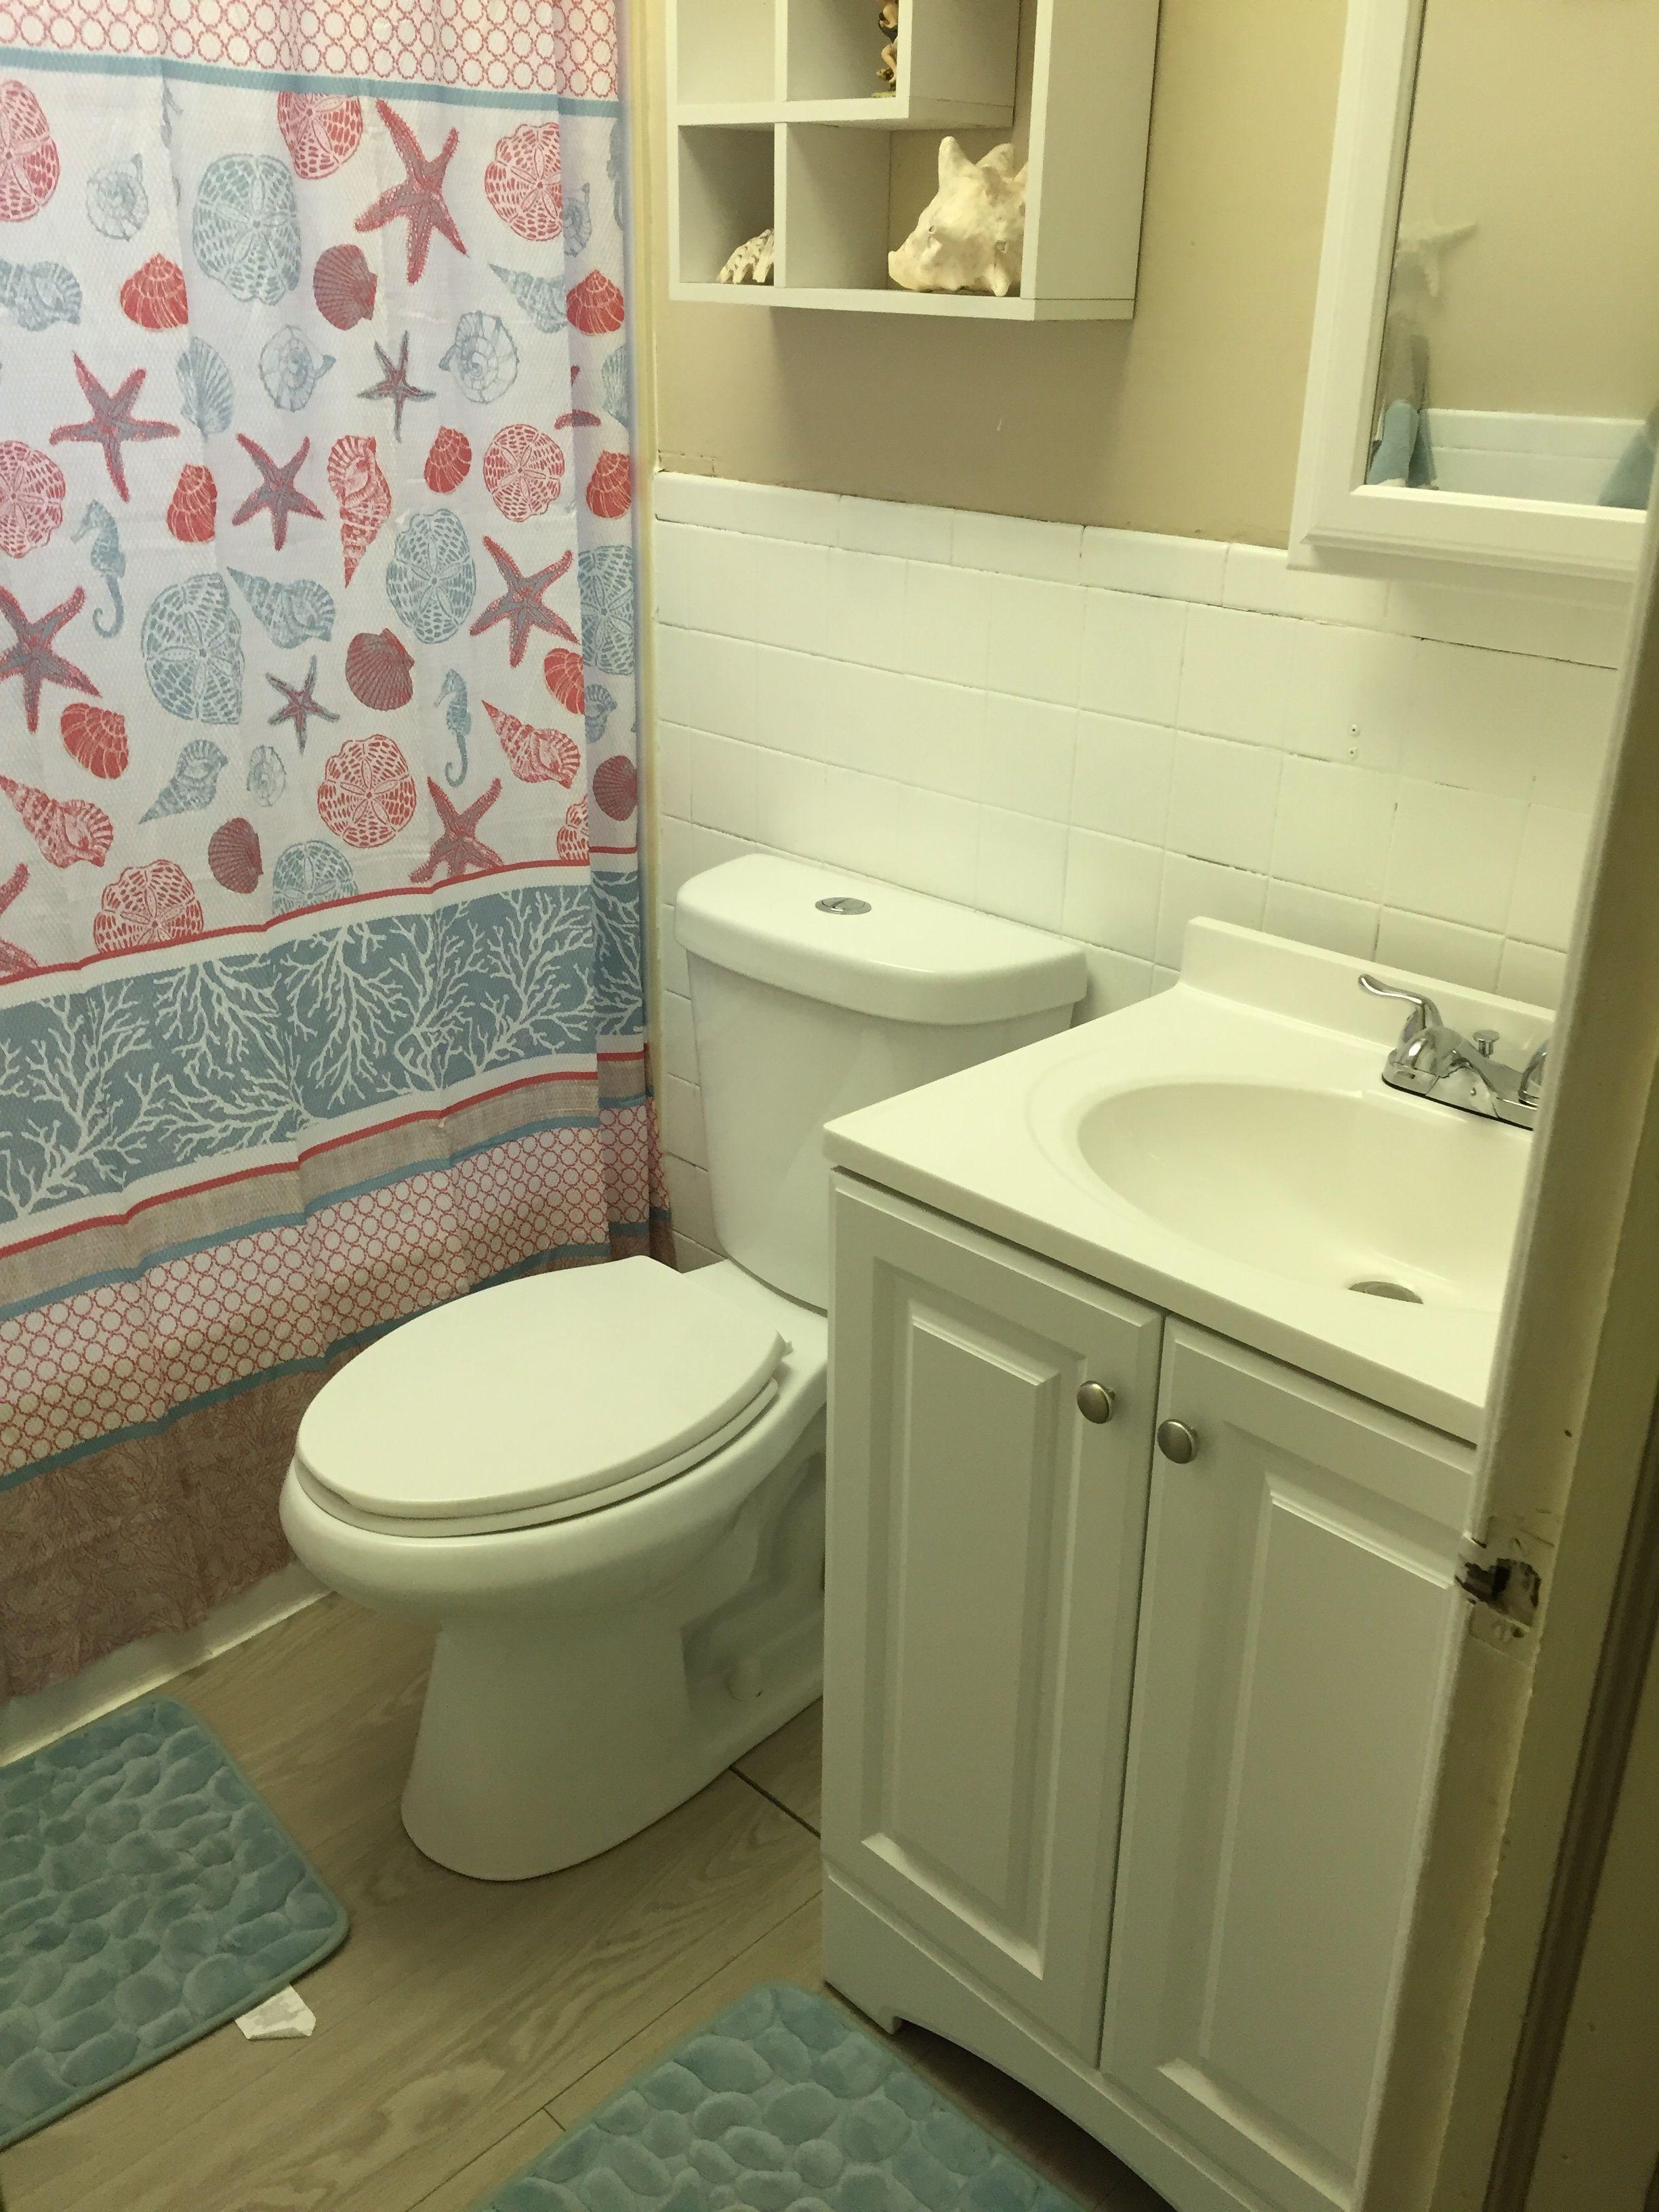 Bathroom decor reveal! Visual tips on decorating a small bathroom to ...